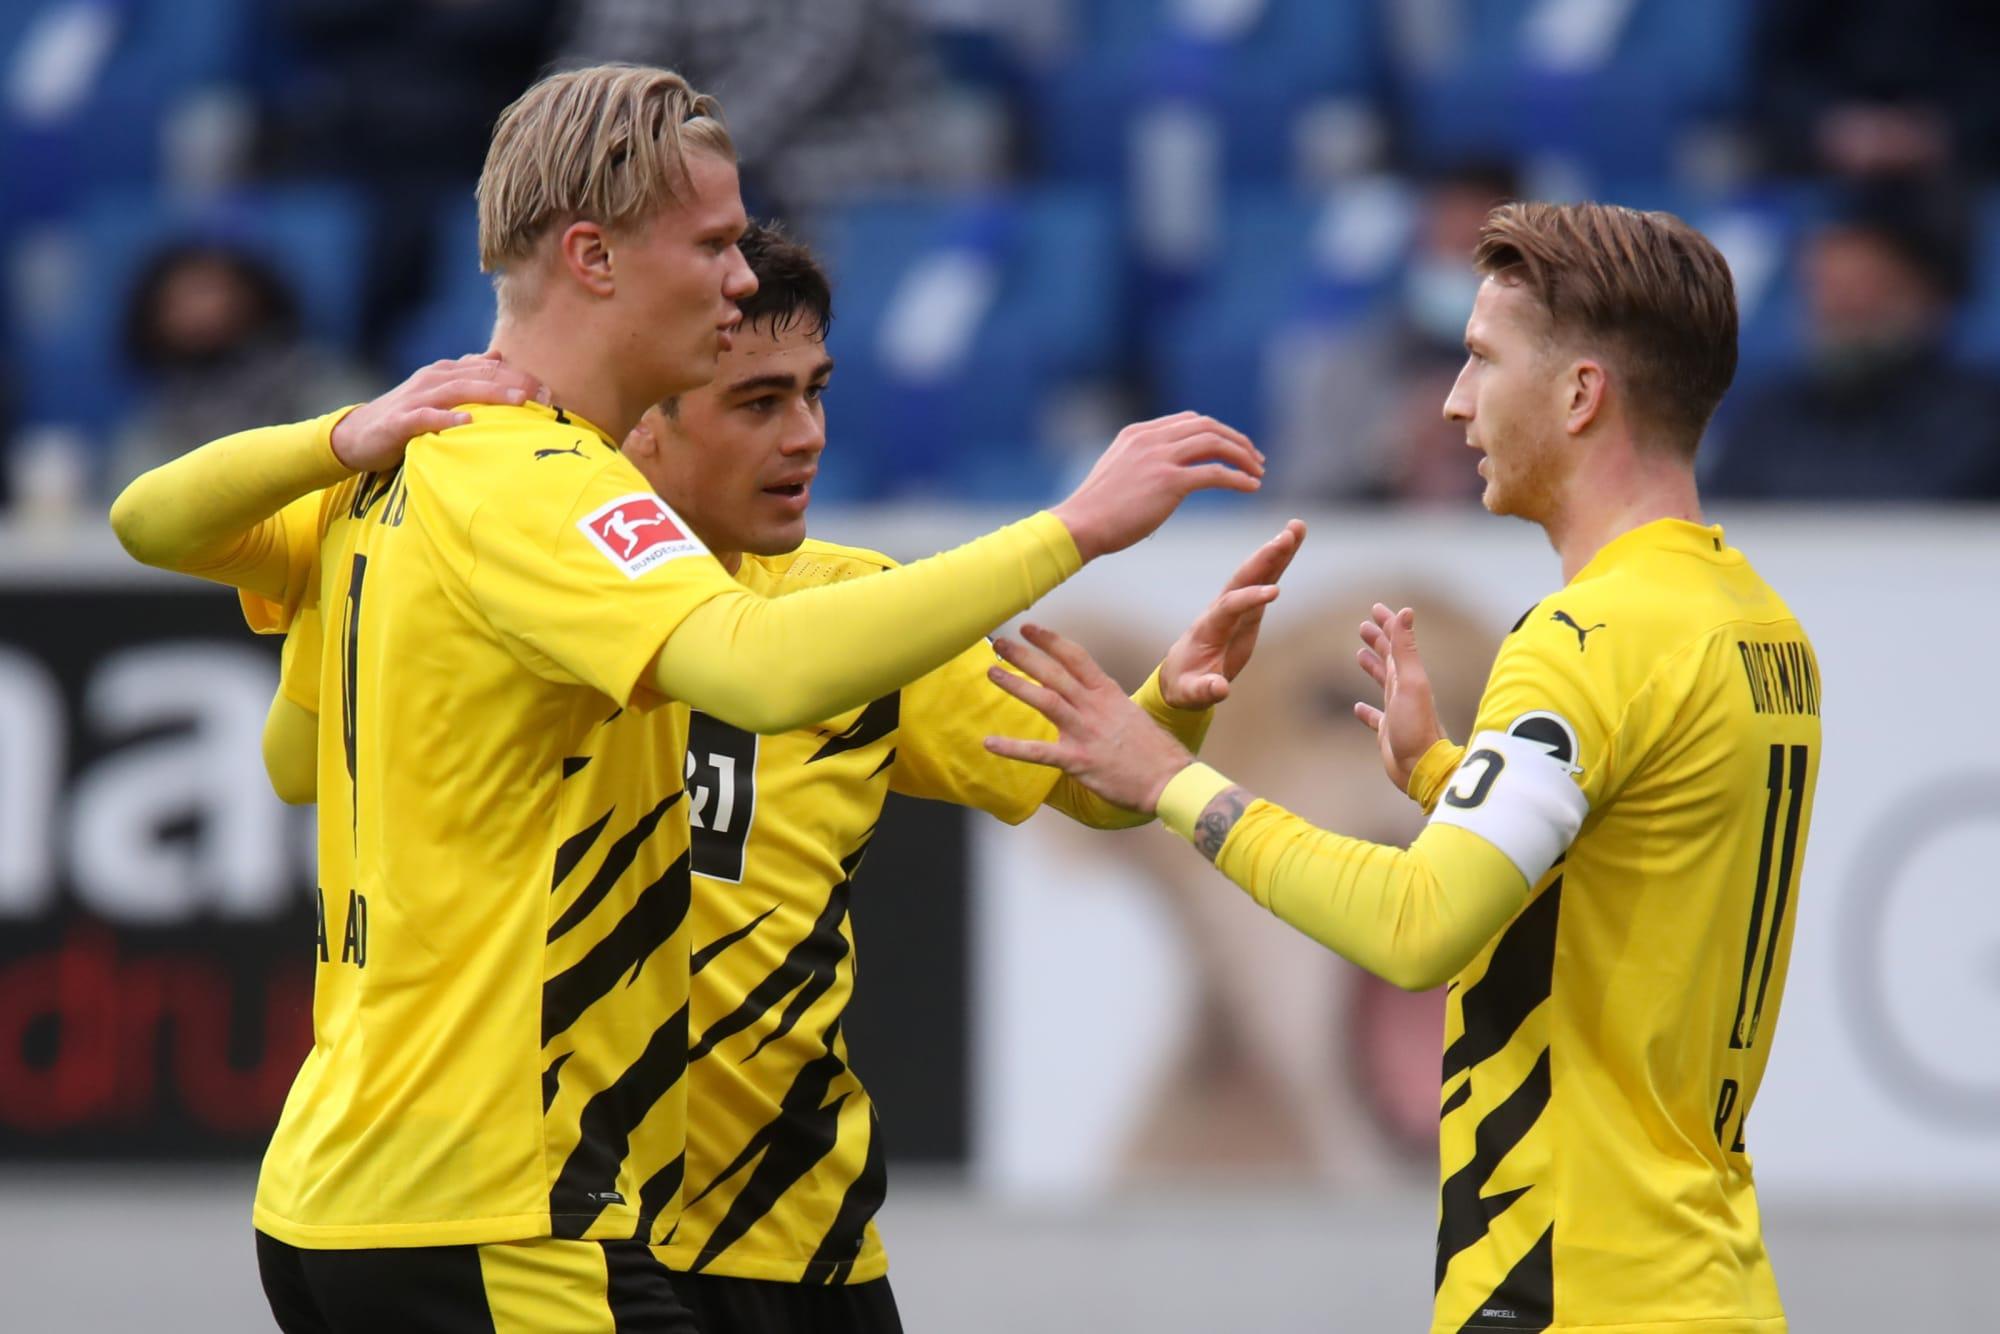 Reus helps Borussia Dortmund earn narrow 1-0 win against Hoffenheim